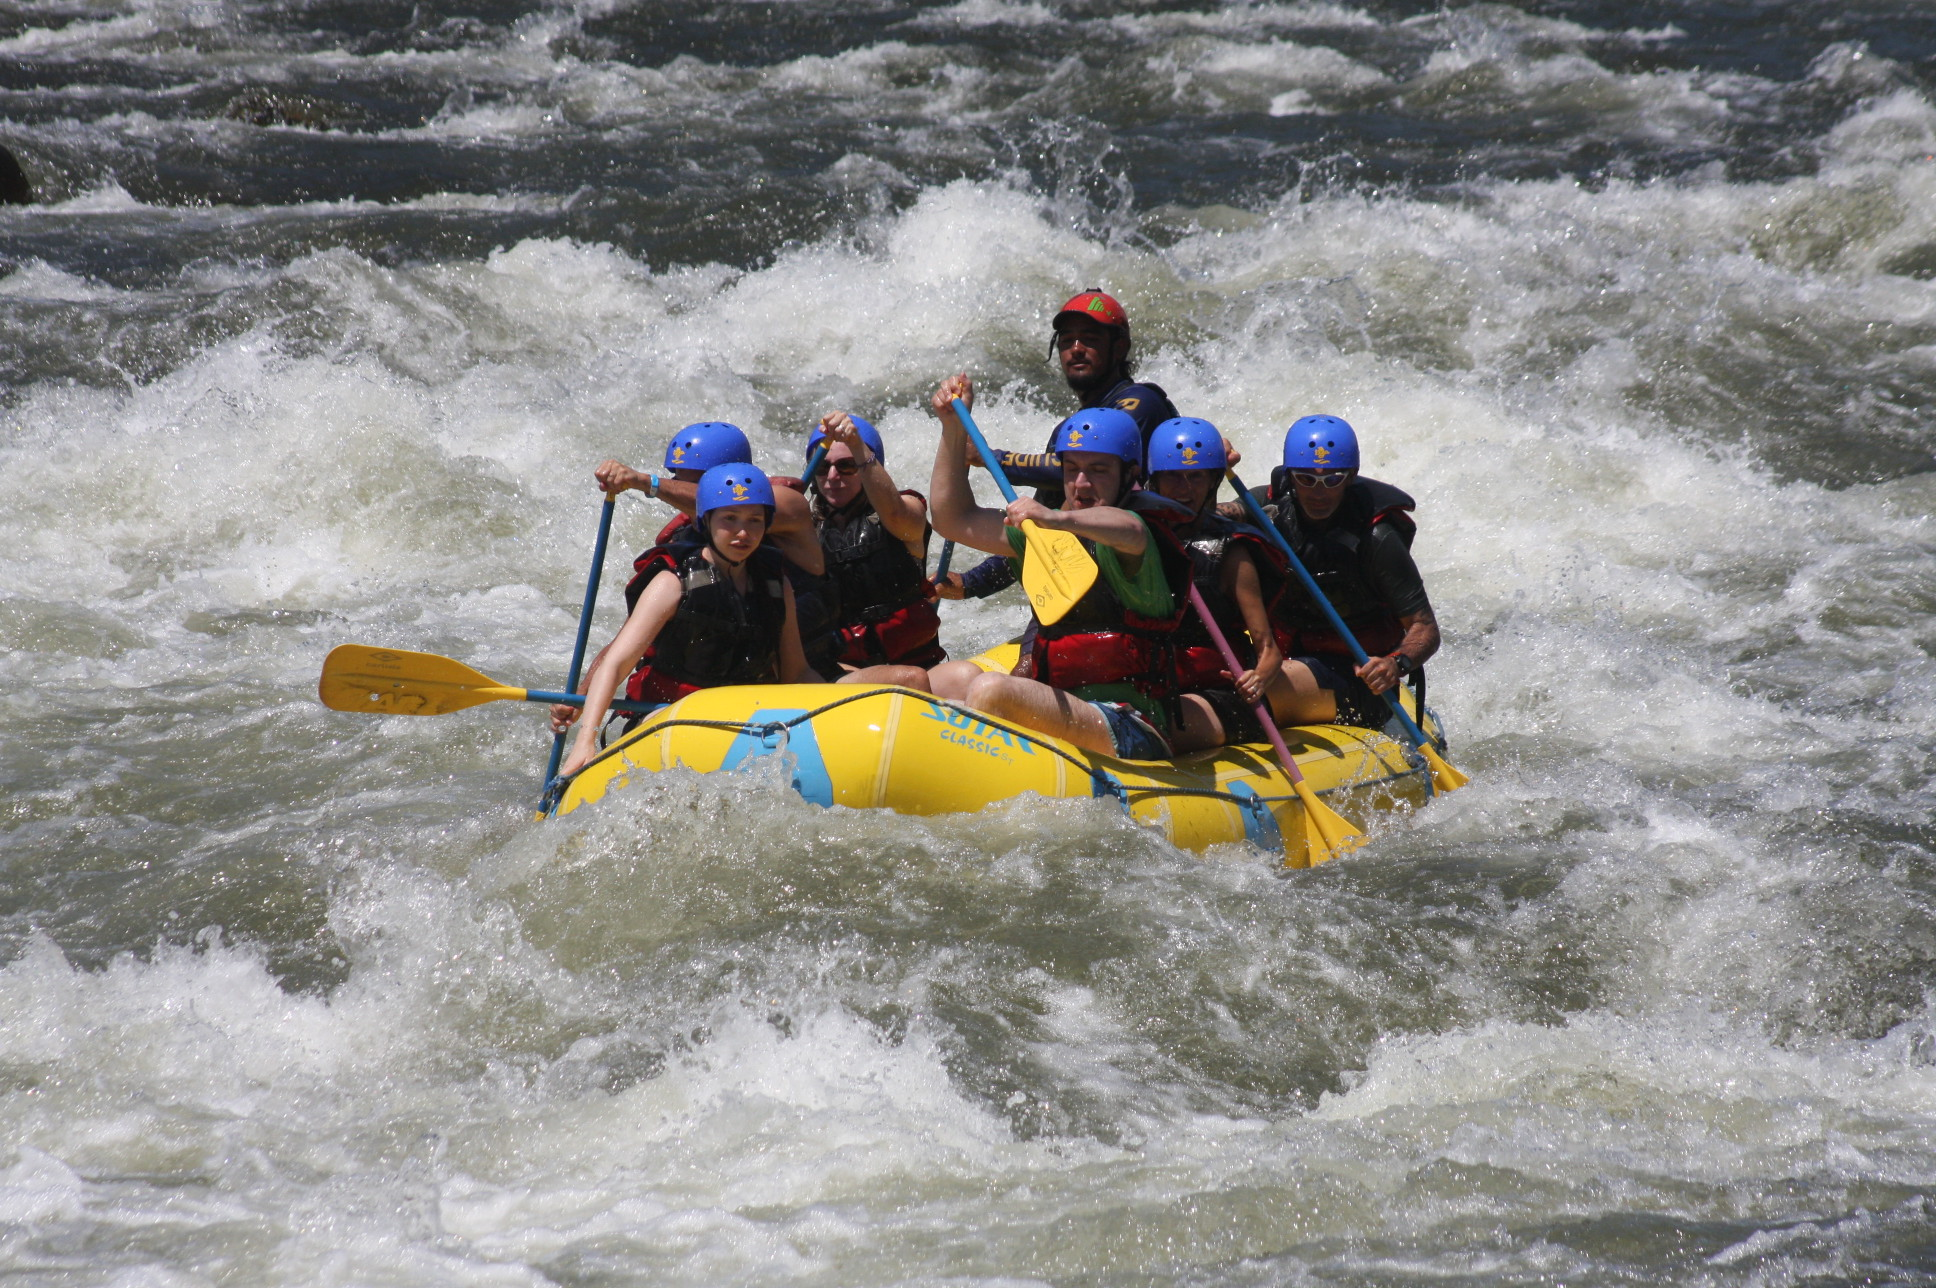 Rafting Sarapiqui River, photo by Allan Baldi